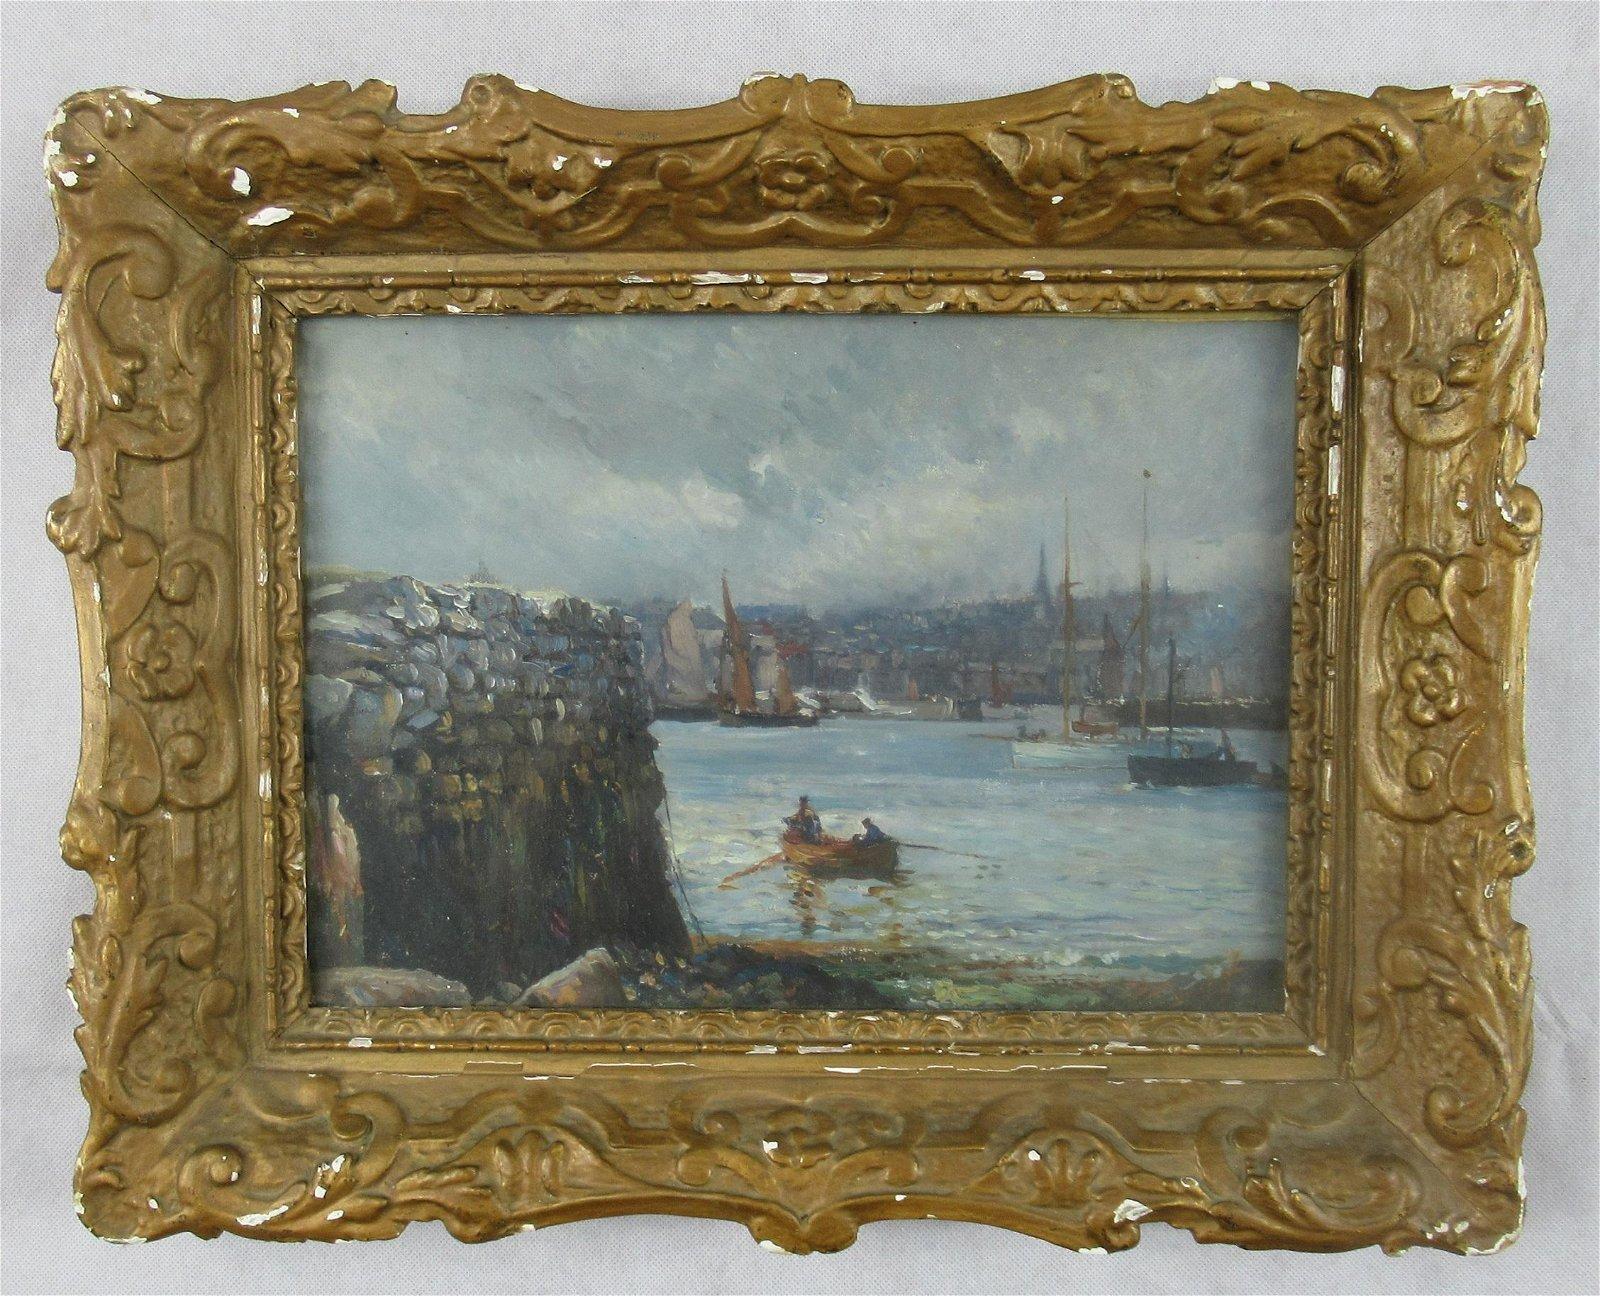 19thC Oil painting